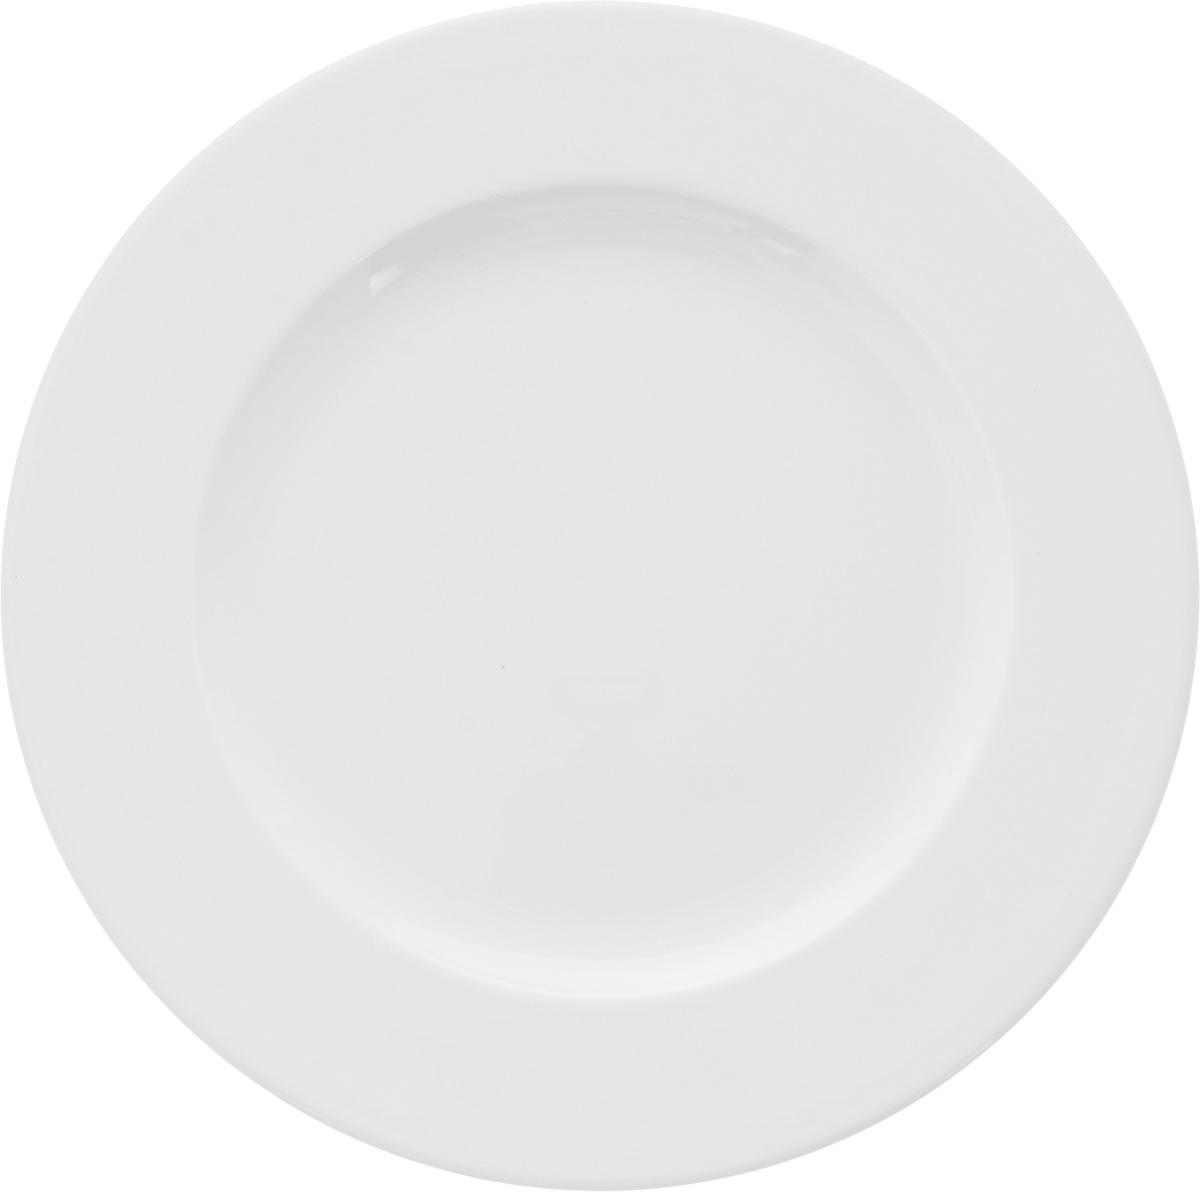 Тарелка мелкая Ariane Прайм, диаметр 21 см